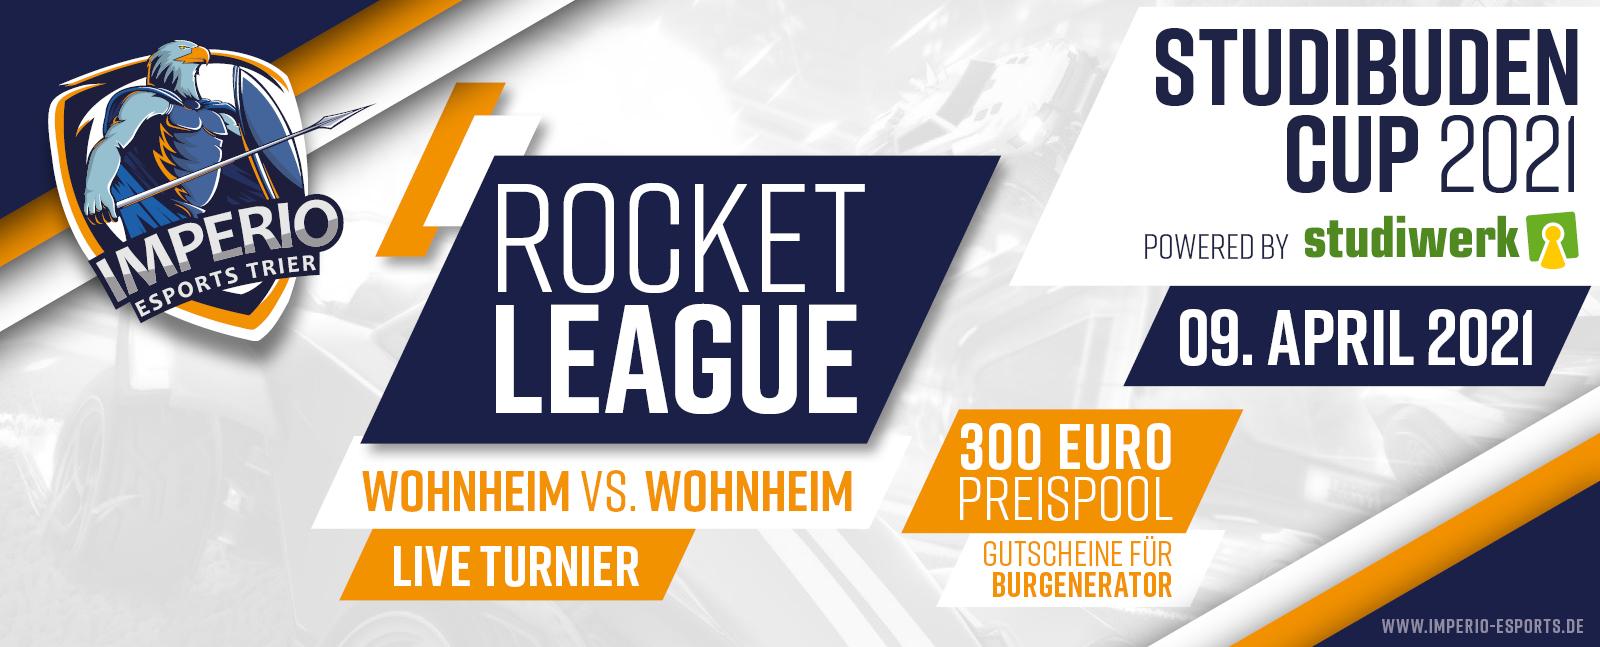 09.04.2021 – Rocket League Studibudencup